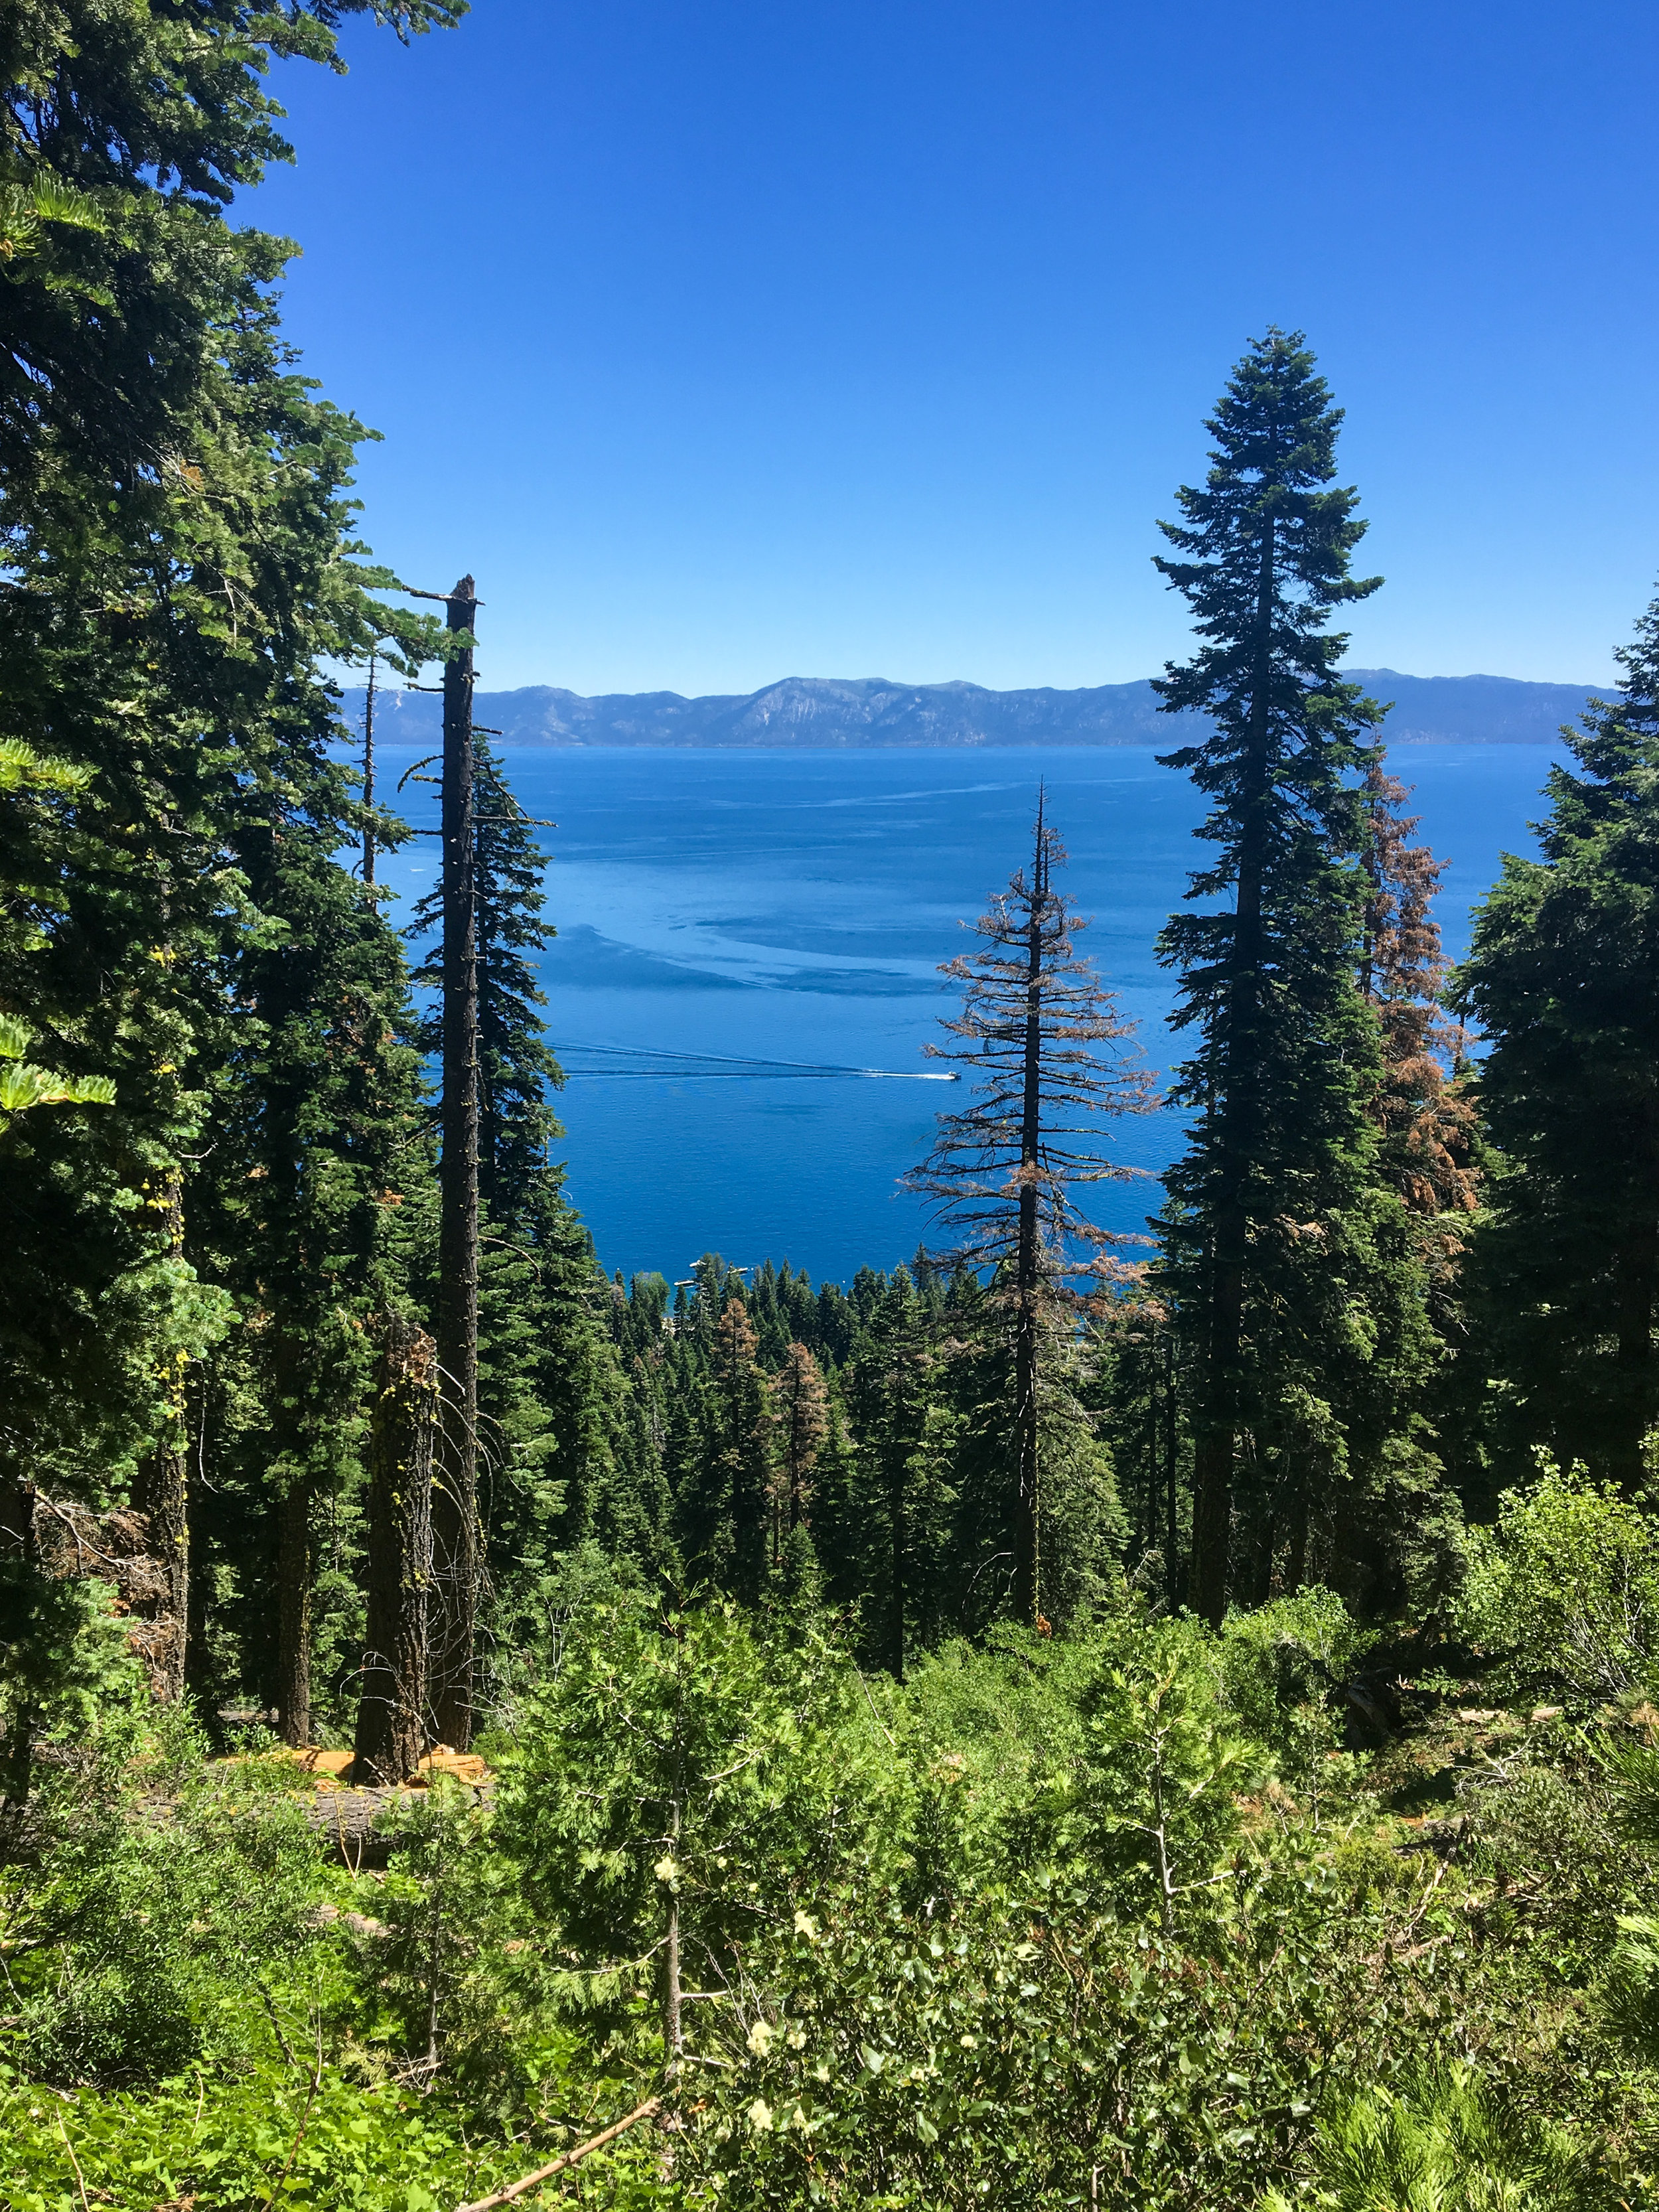 LakeTahoe_View.jpg